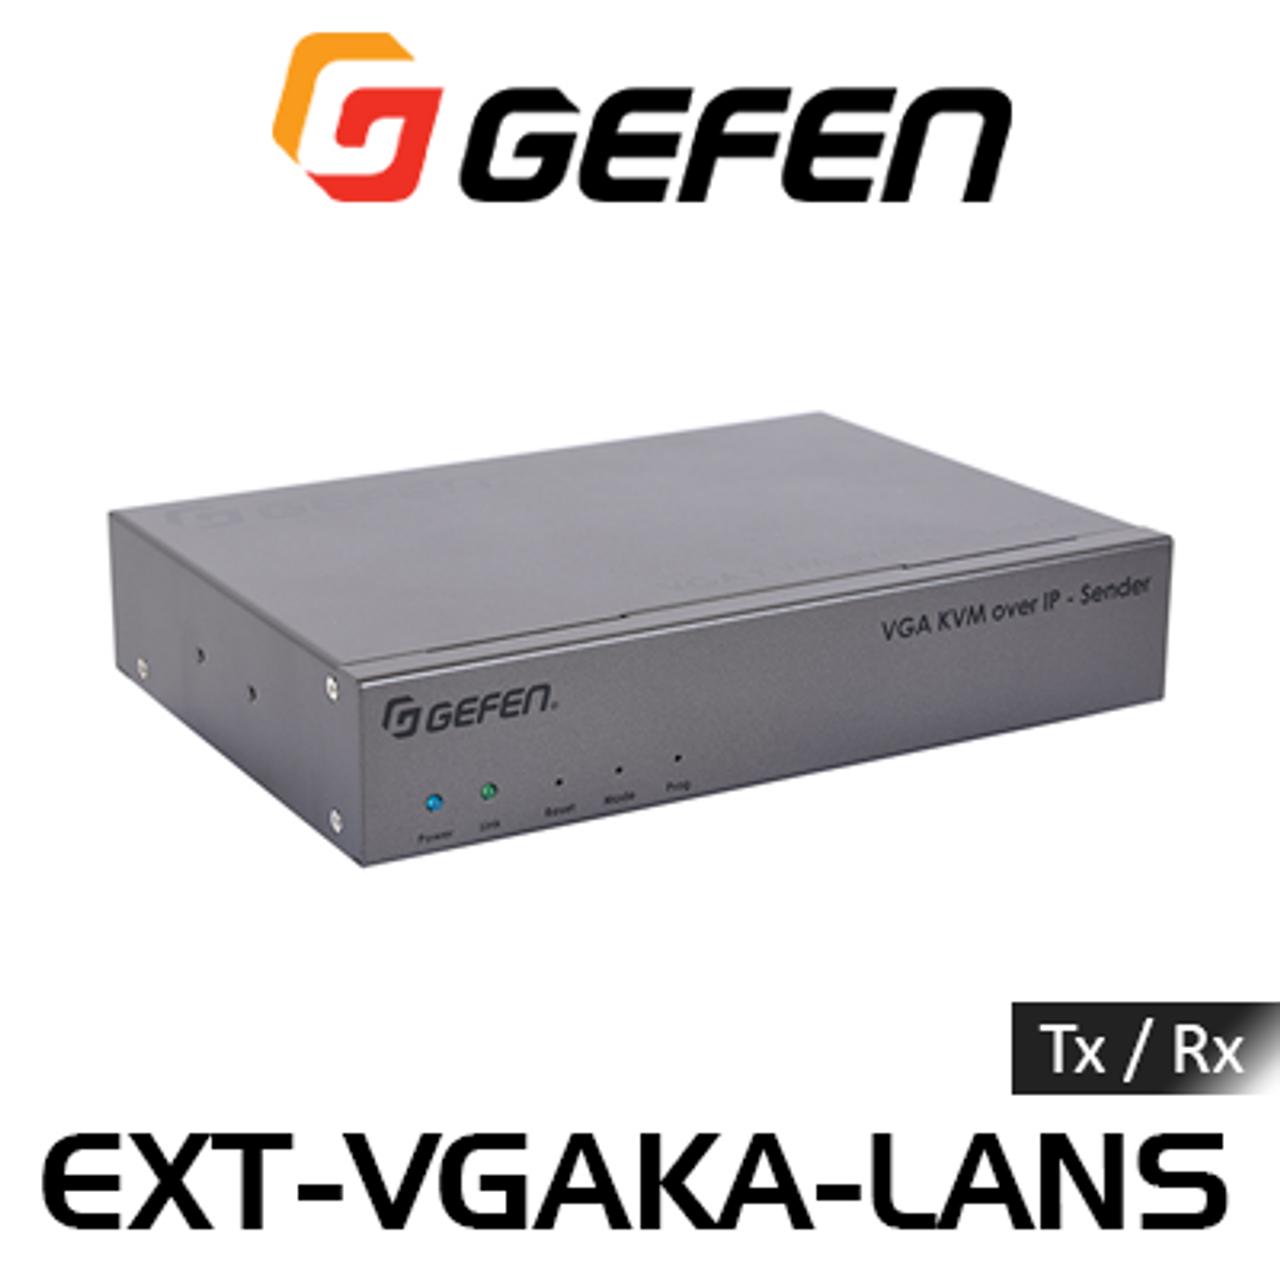 Gefen VGA KVM, USB, Analog Audio, IR & RS232 Over IP